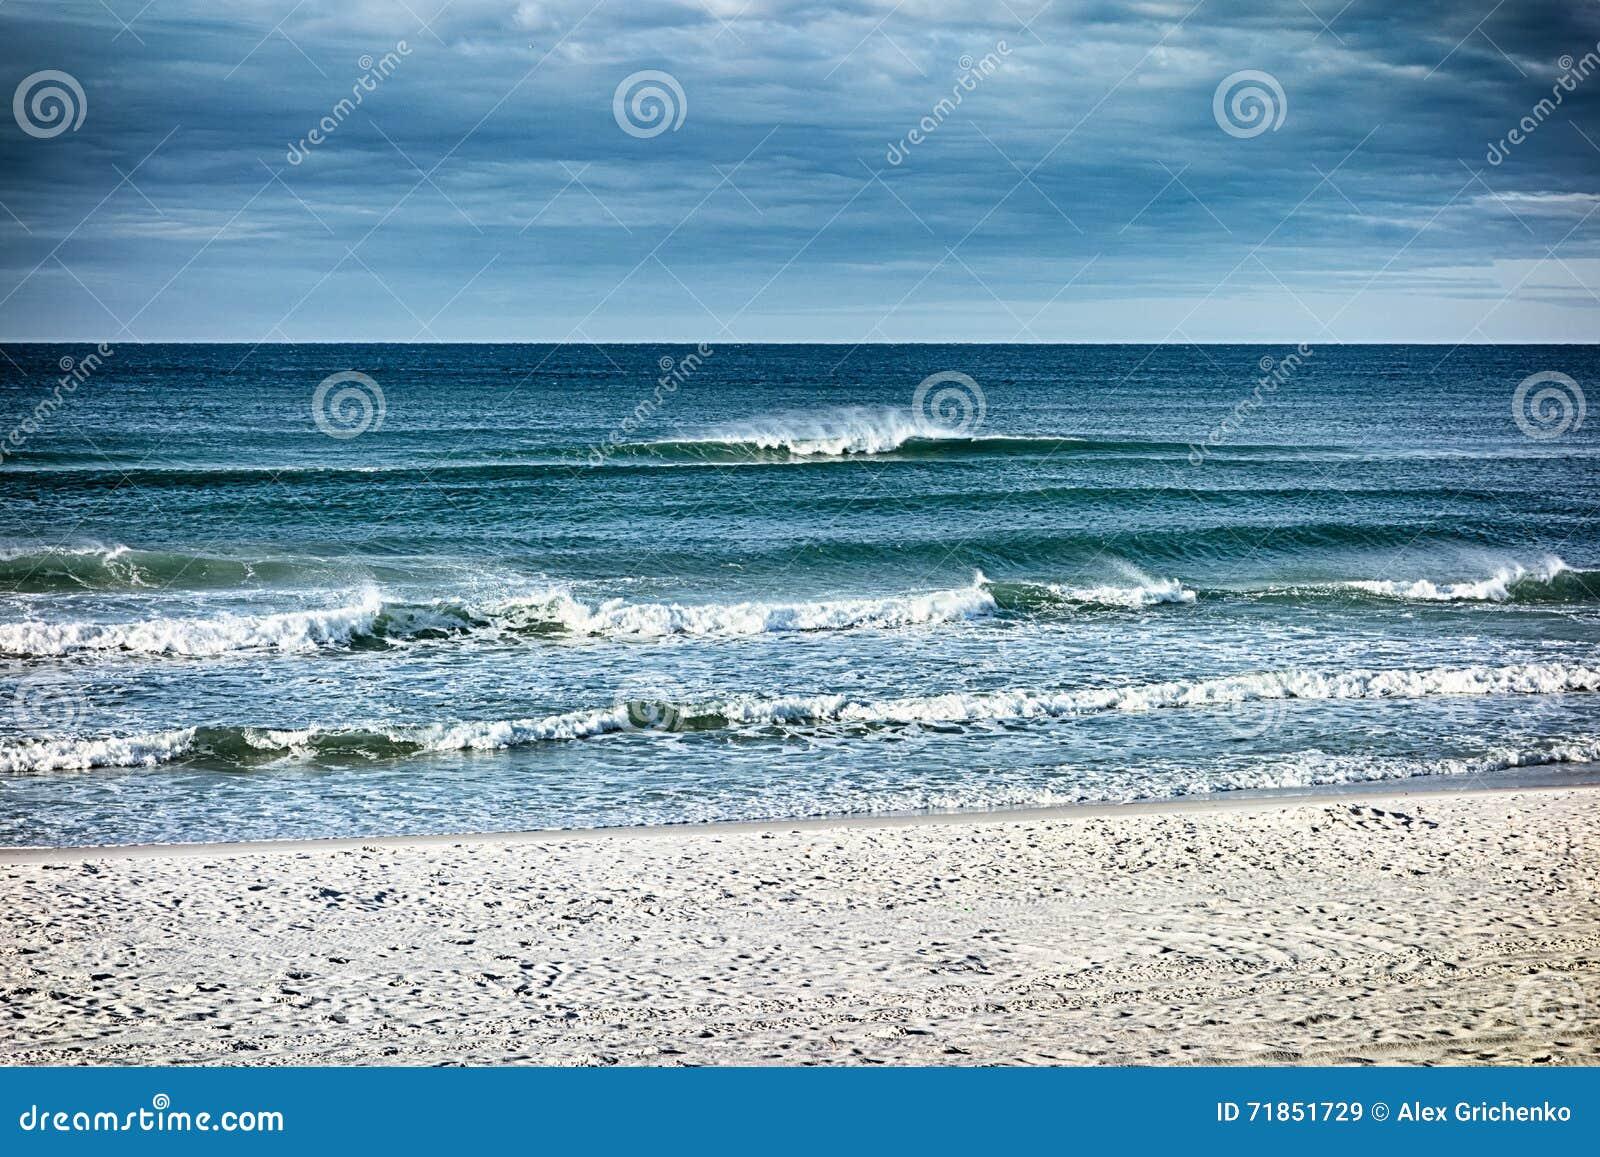 destin florida beach scenes stock image - image of nature, sunset